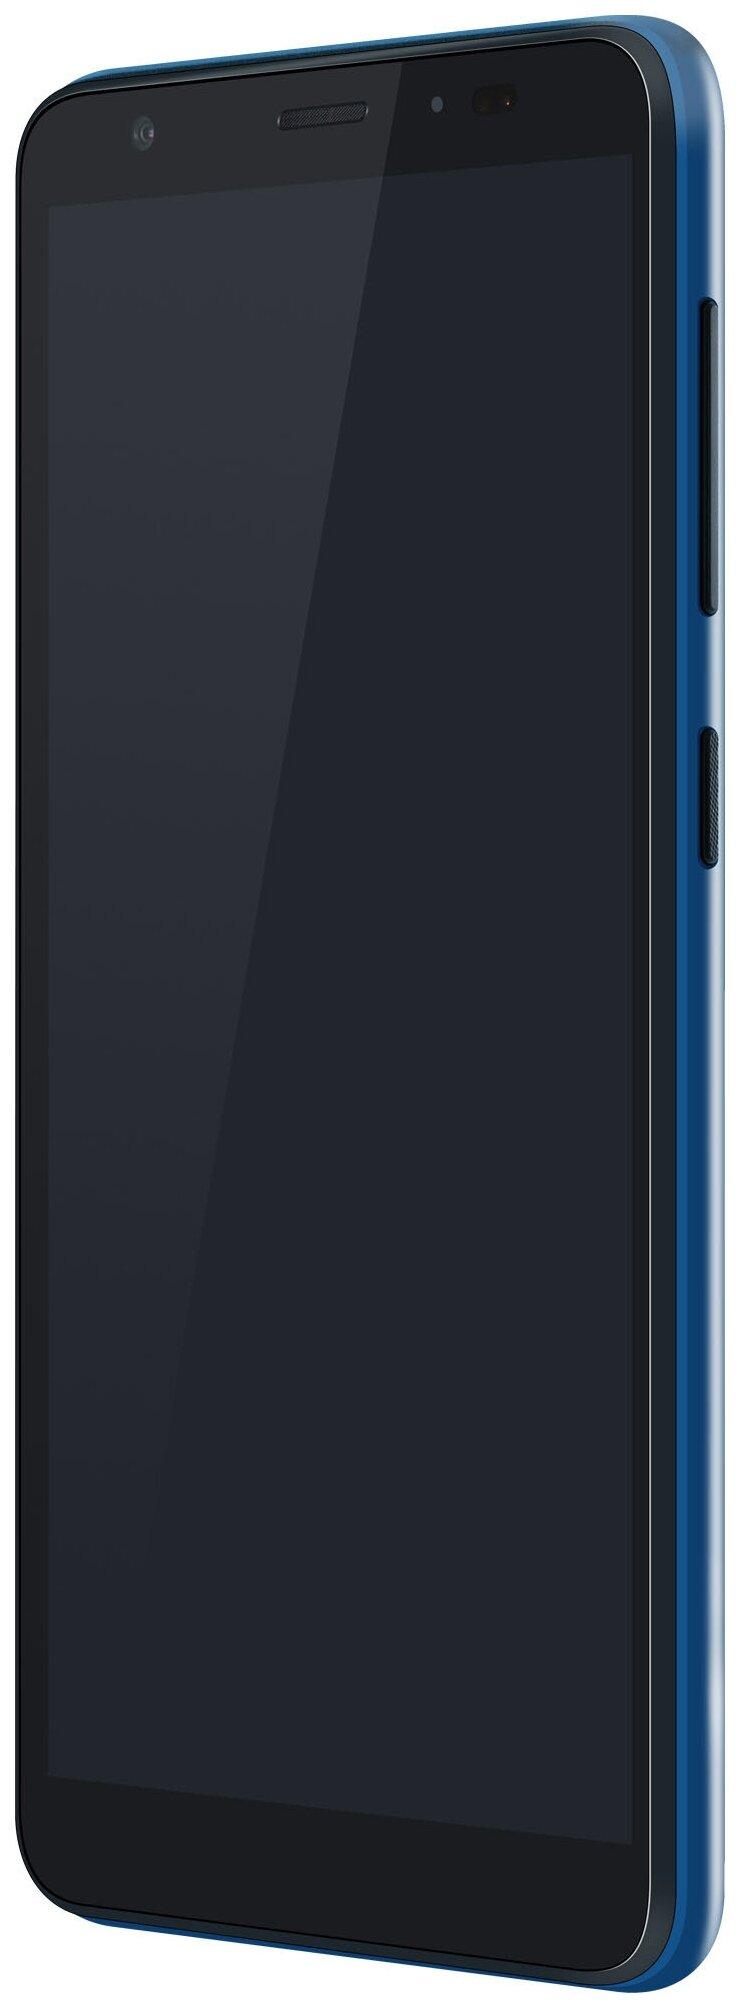 ZTE Blade A5 (2019) 2/32GB - операционная система: Android 9.0